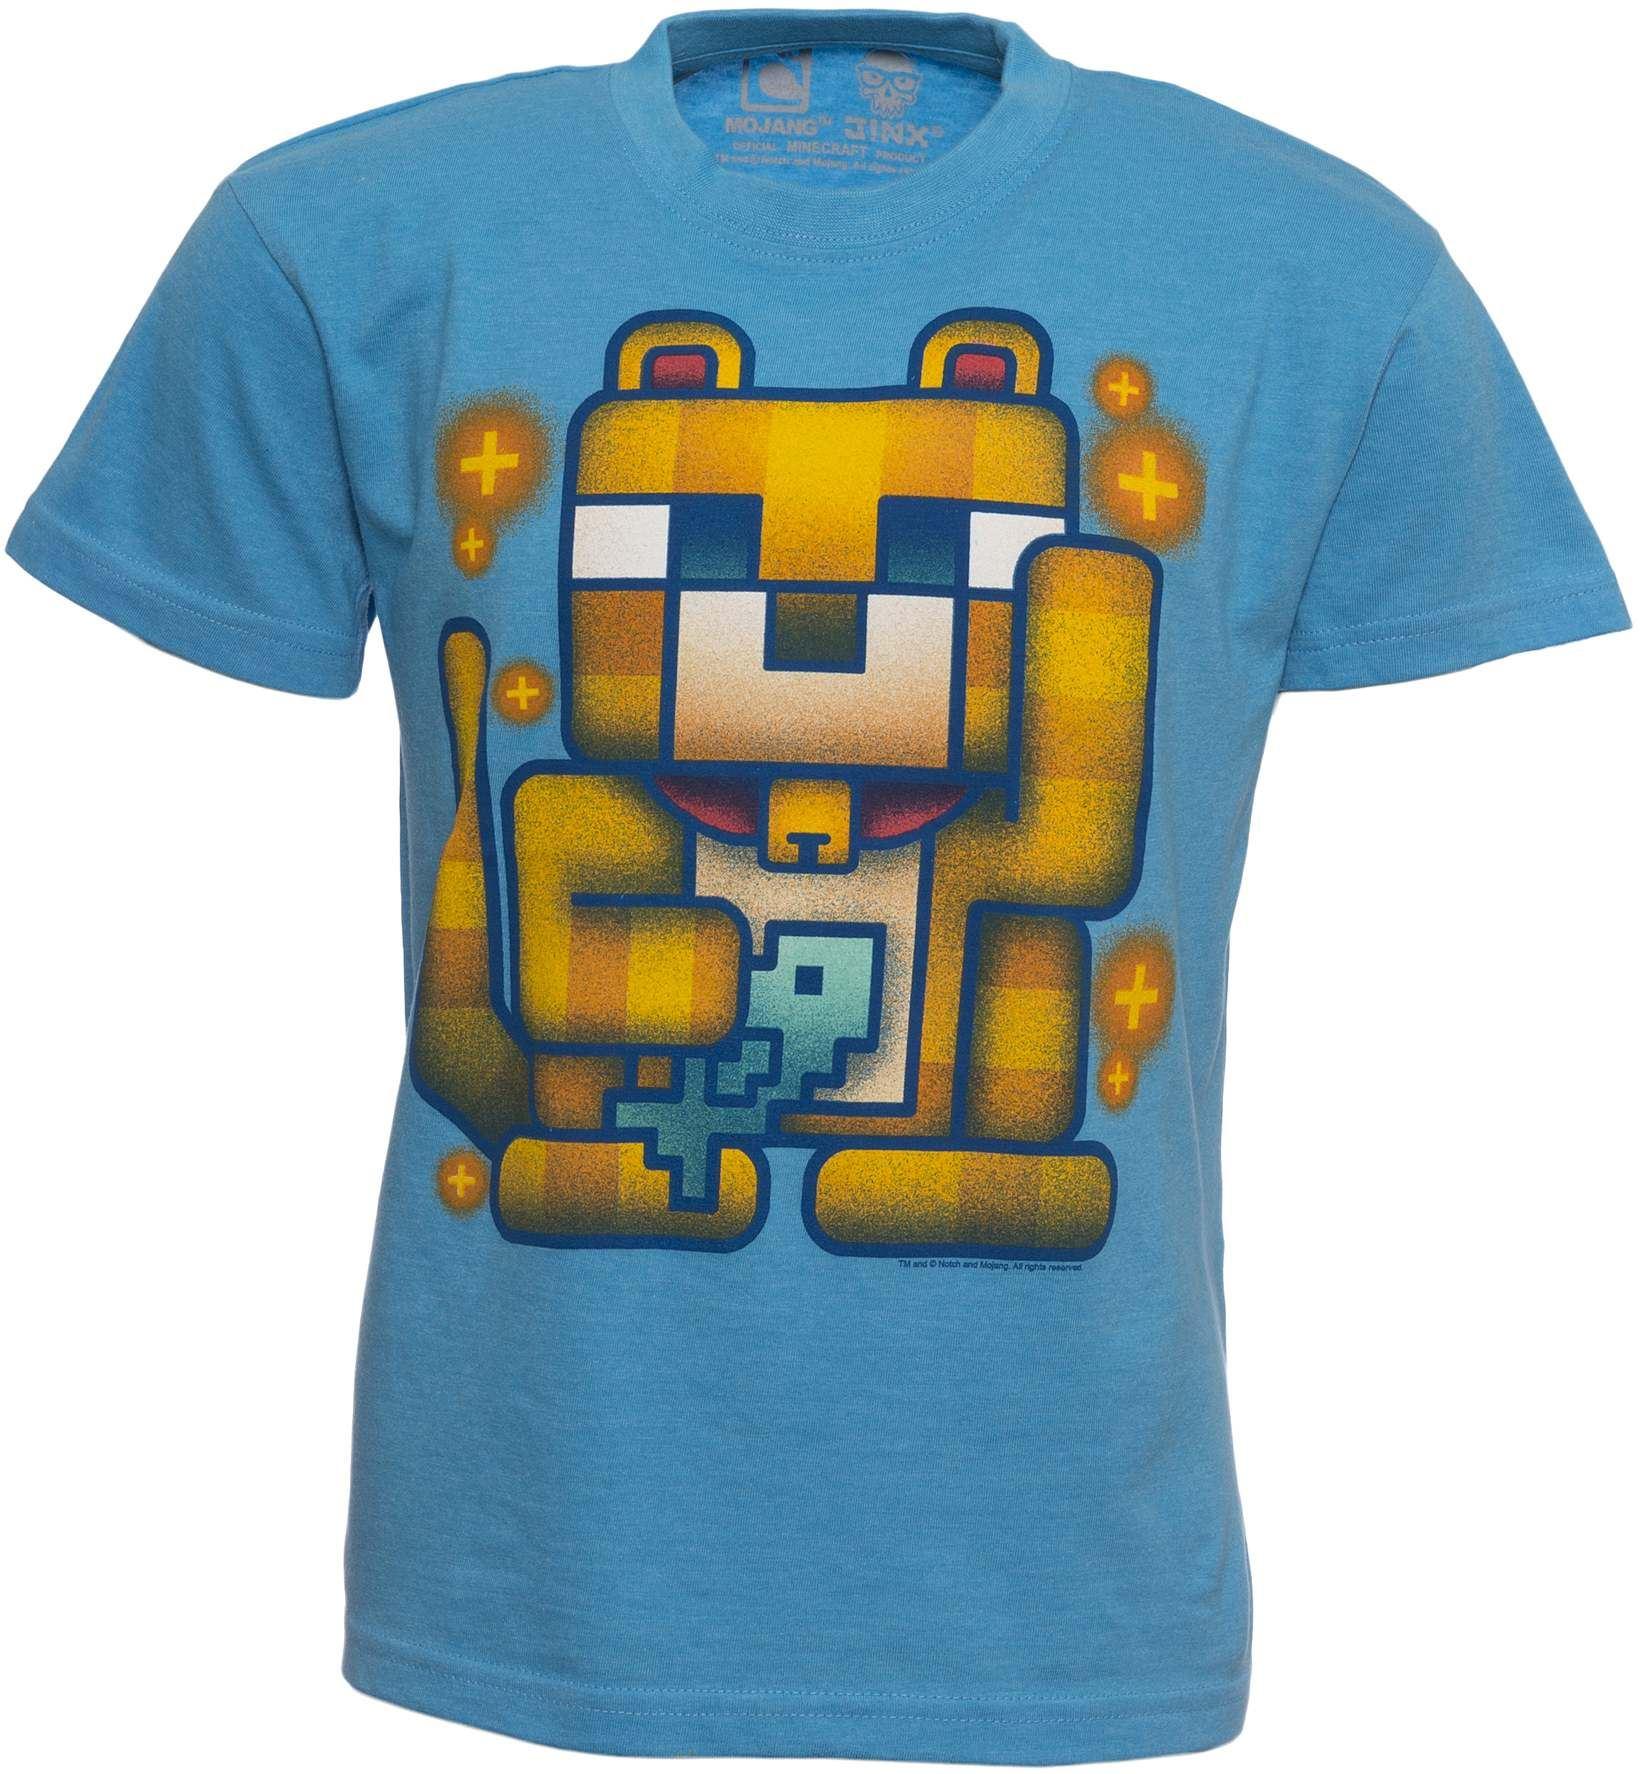 Lucky ocelot blue minecraft official t shirt kids youth t for Mine craft t shirt